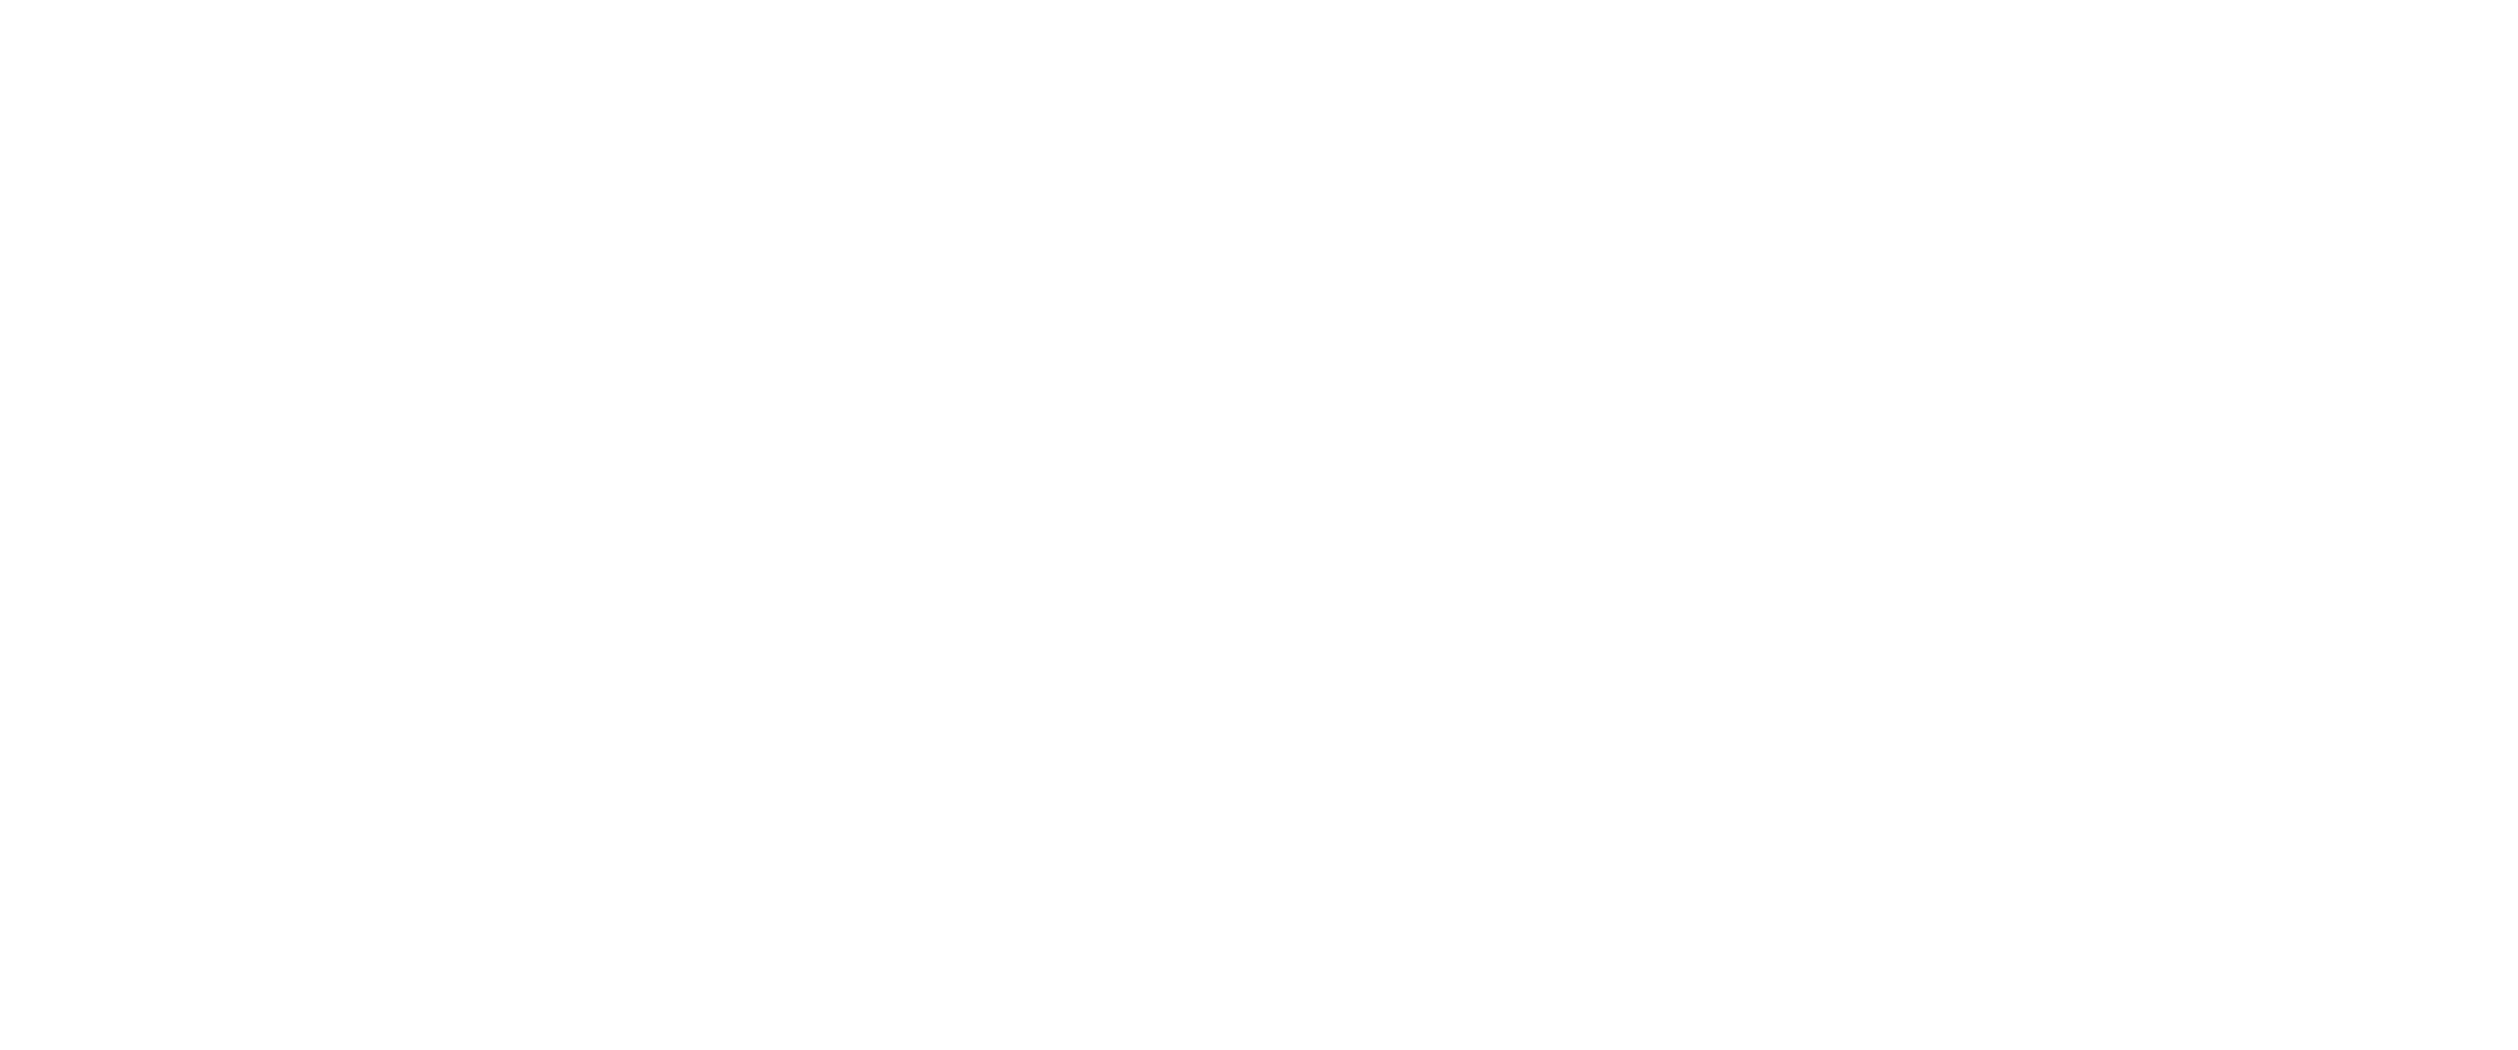 John B. Moore Documentary Studies (MDOCS) @ Skidmore College